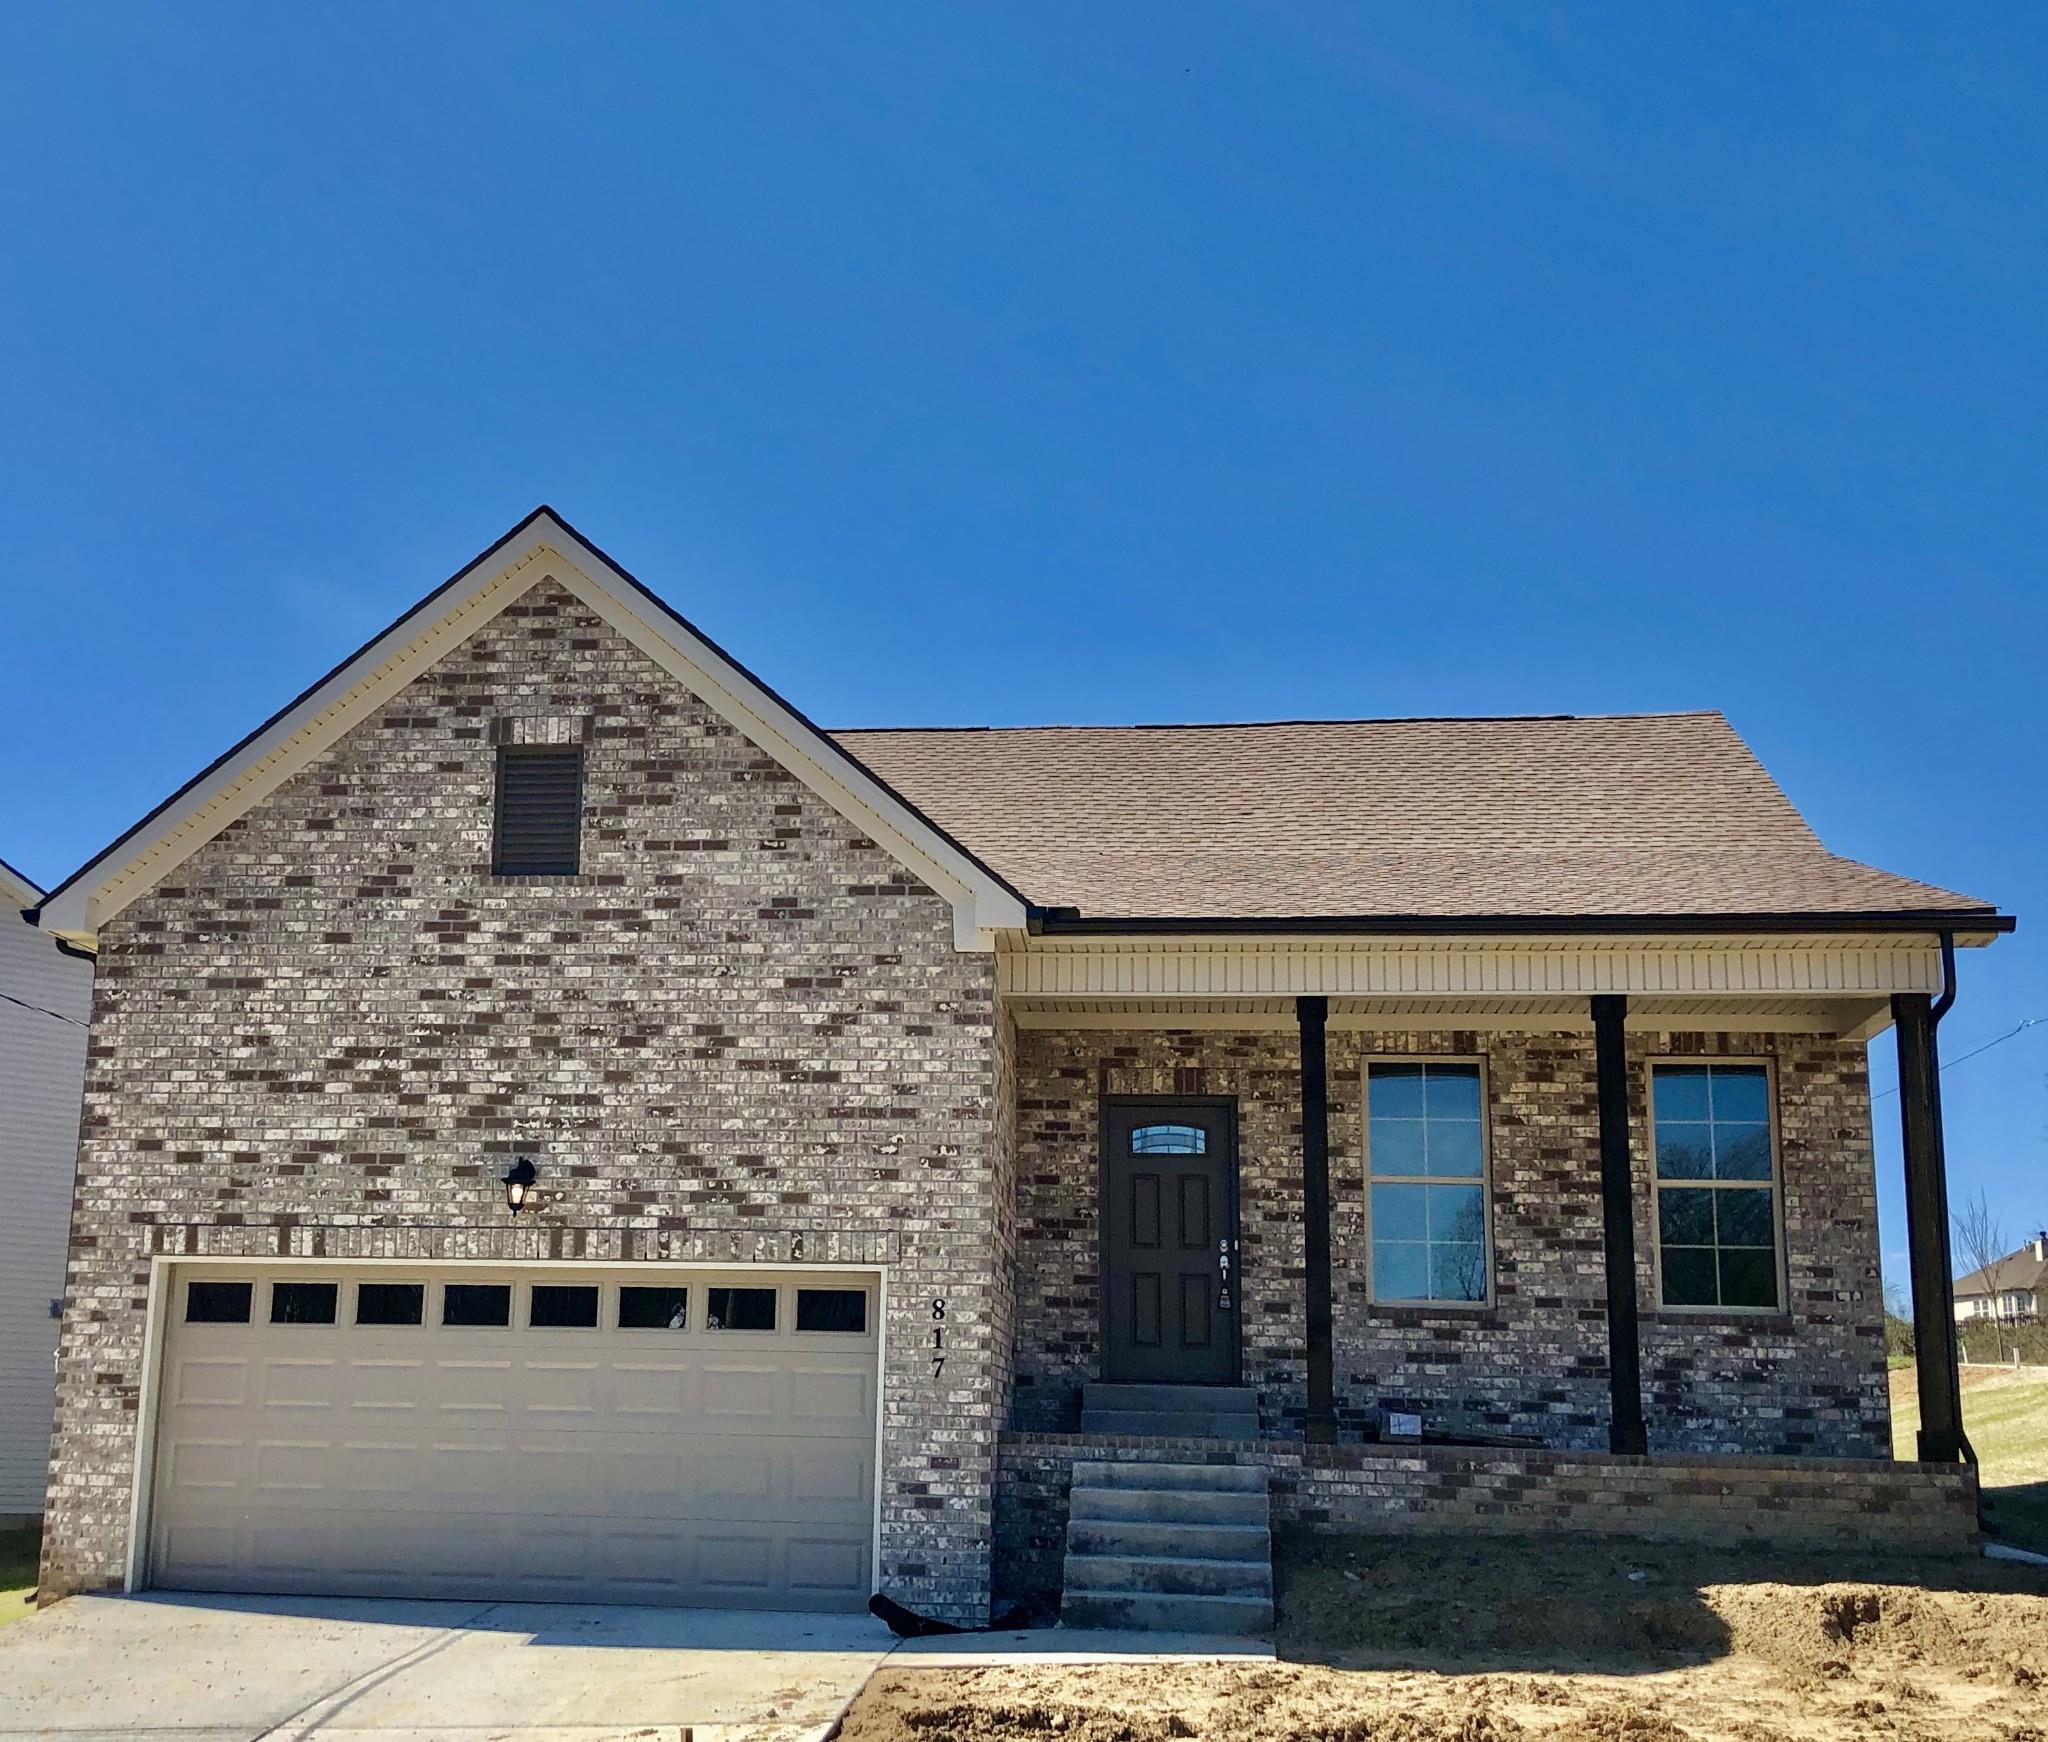 817 Bridge Creek Lane #162, Antioch, TN 37013 - Antioch, TN real estate listing